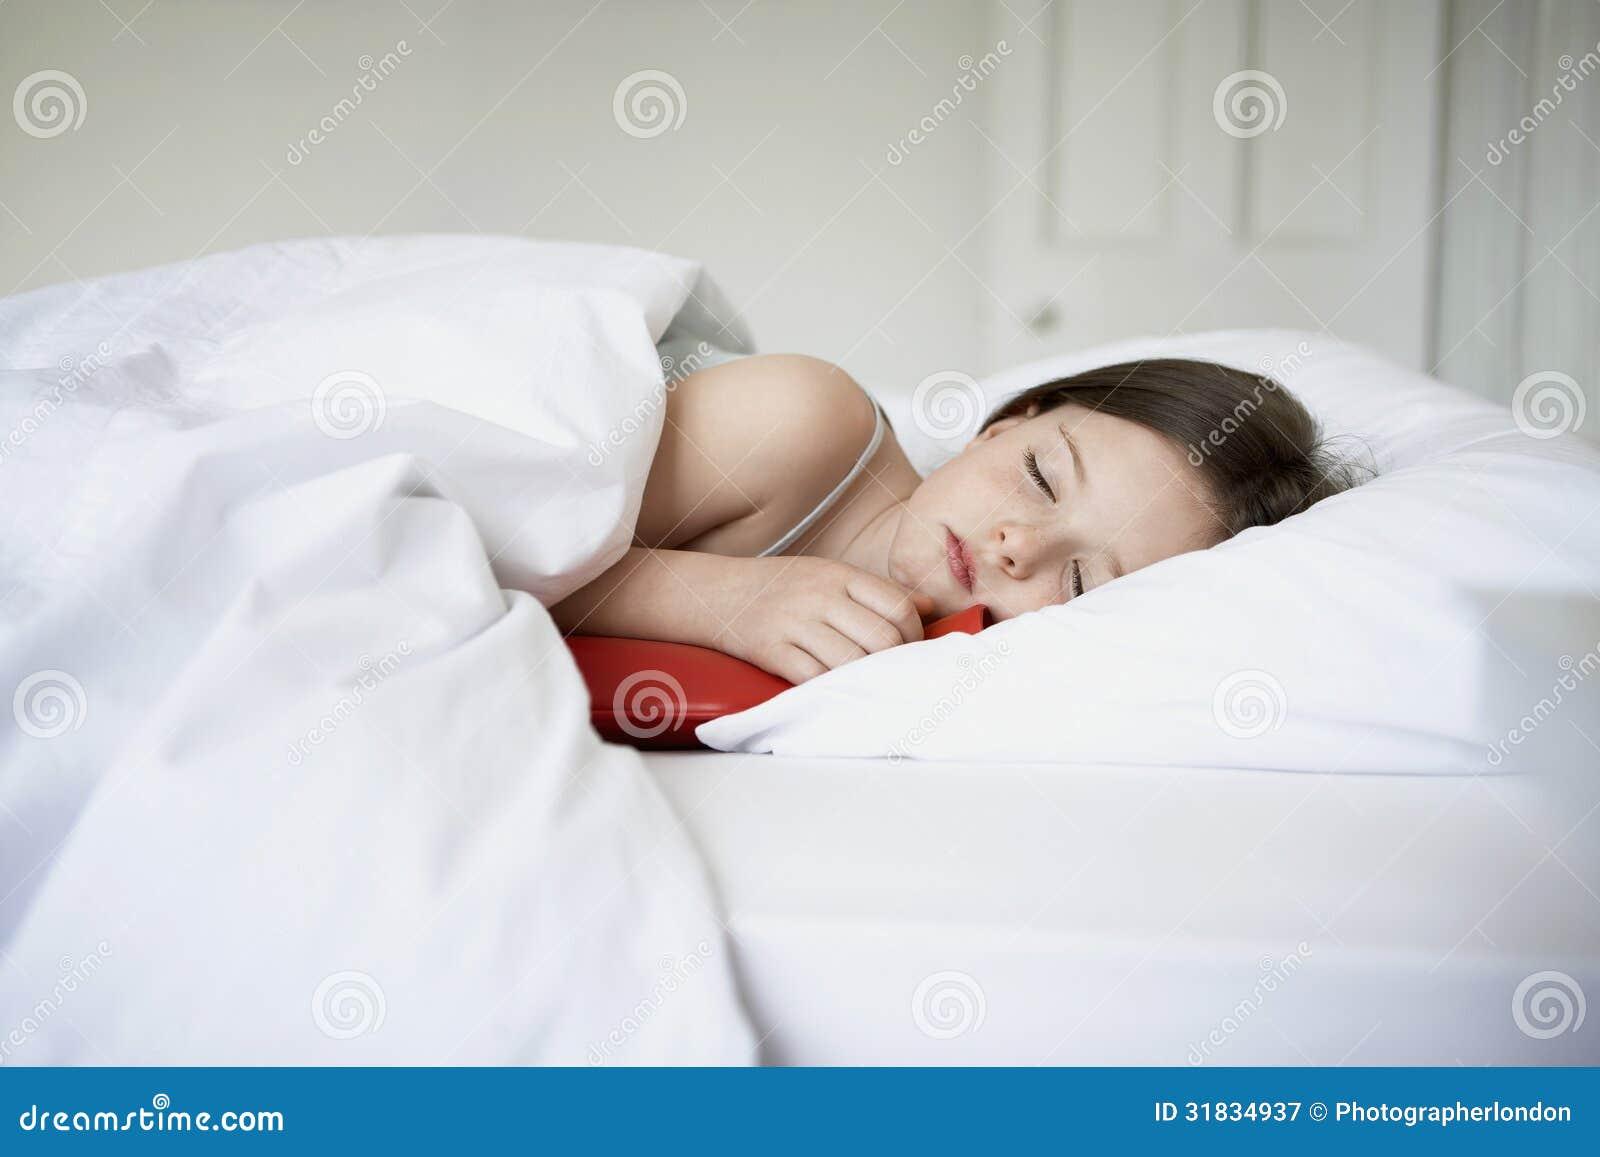 Hot asian girls sleeping